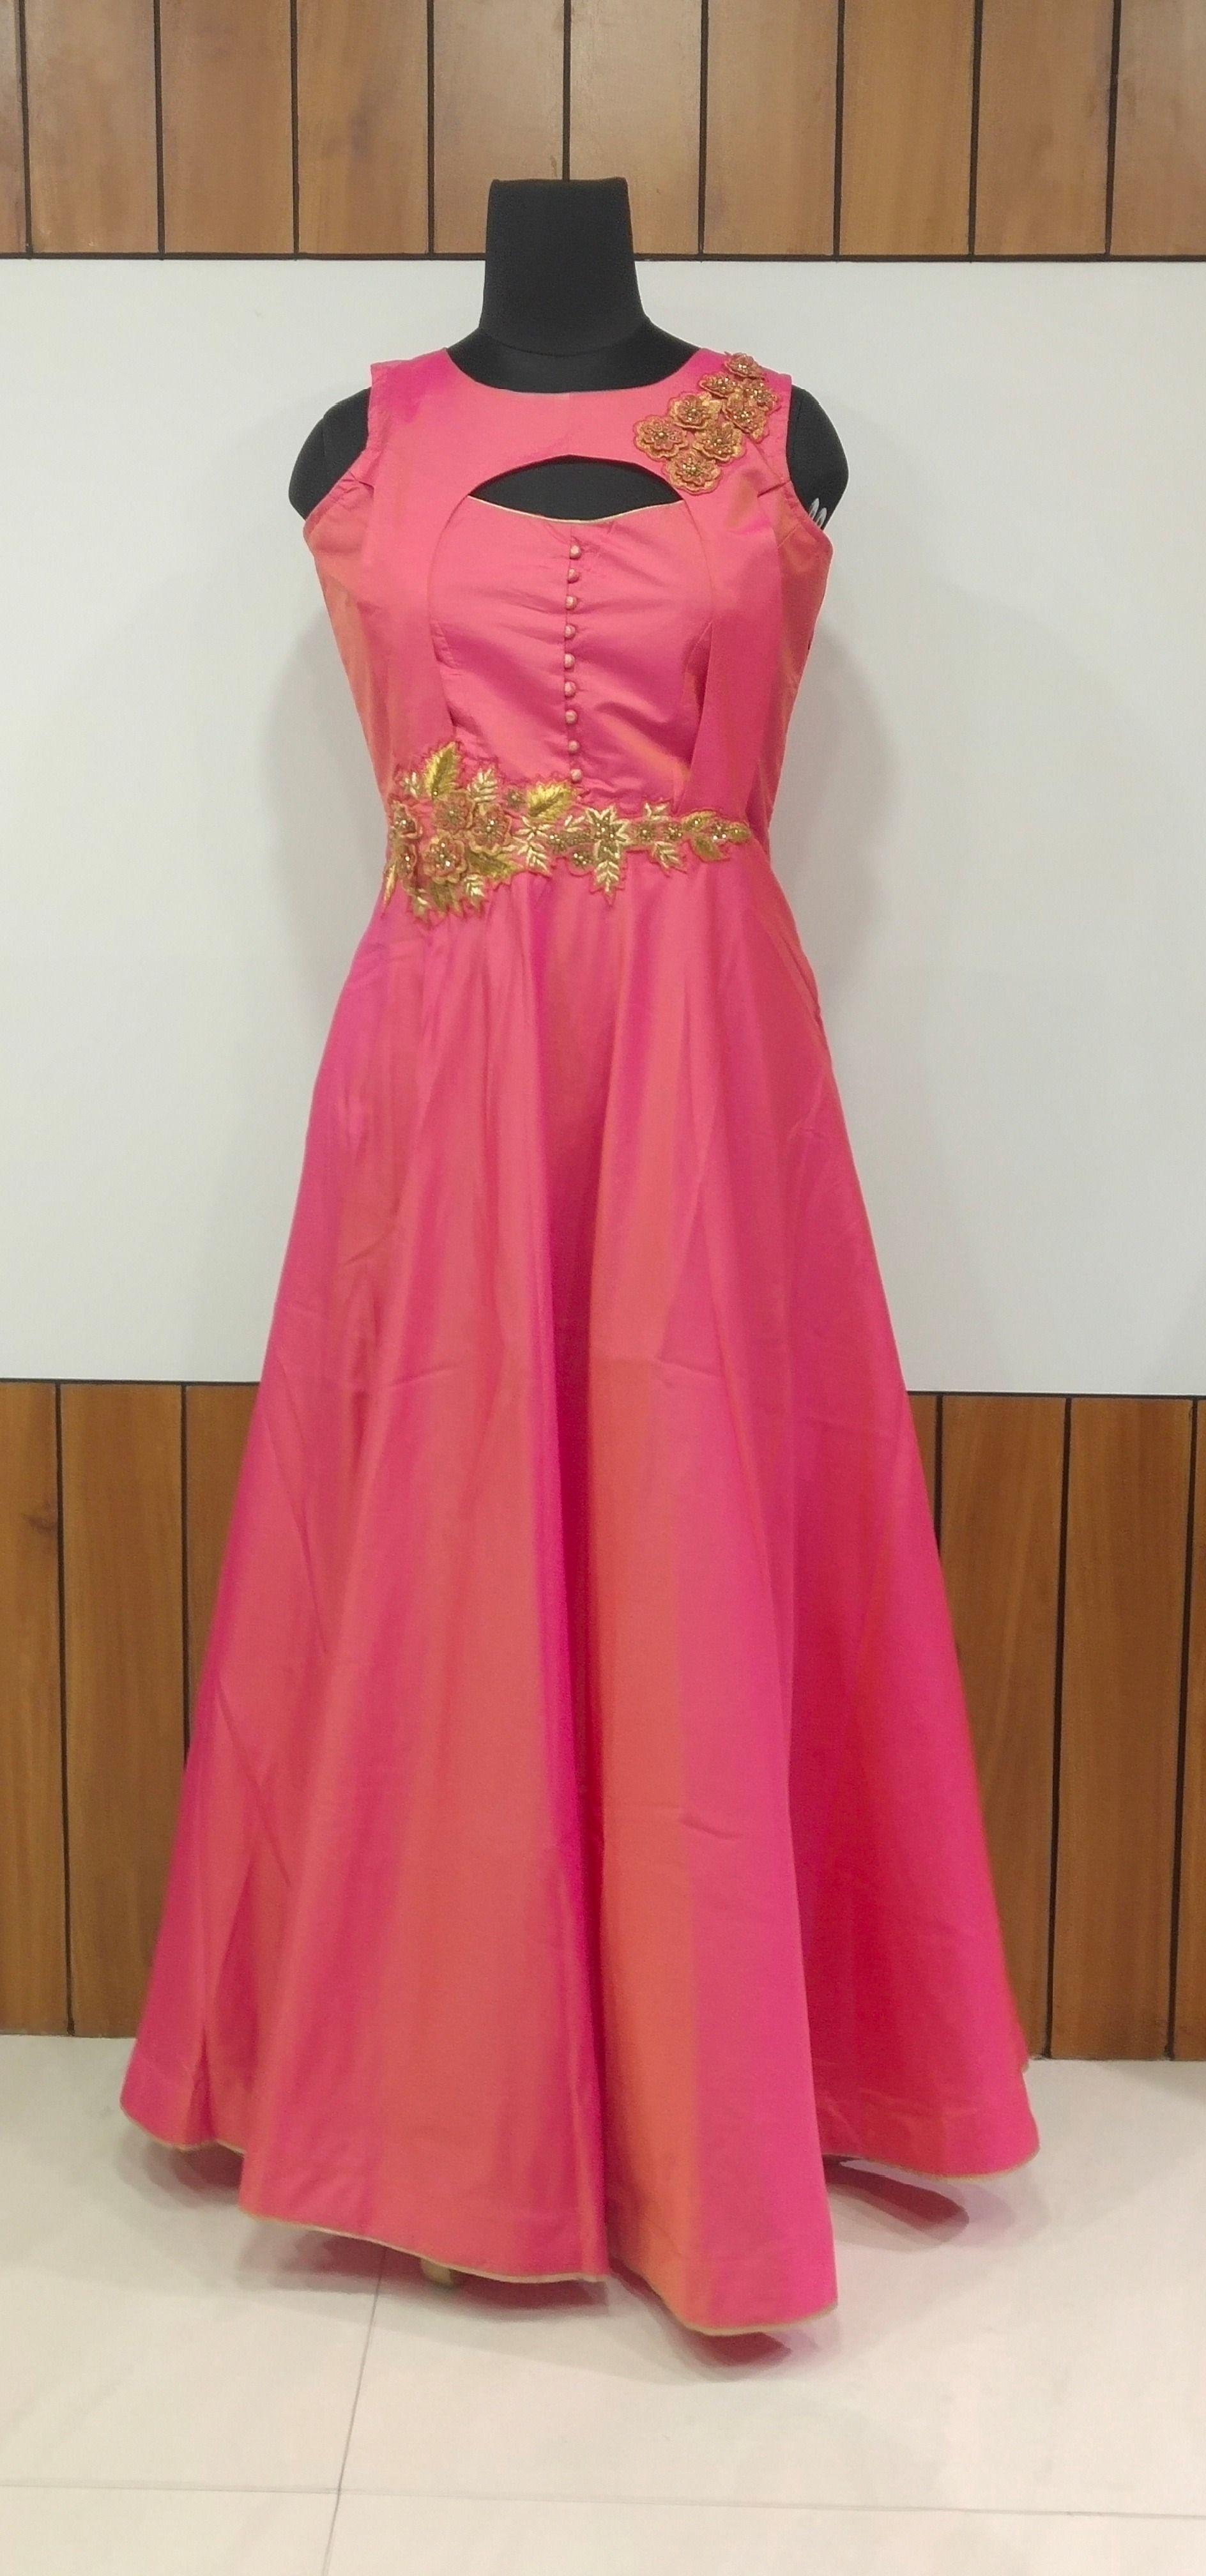 Siya Siyafashion Designer Pink Taffetasilk Handwork Gown One Piece Gown Simple Gowns Fashion Design